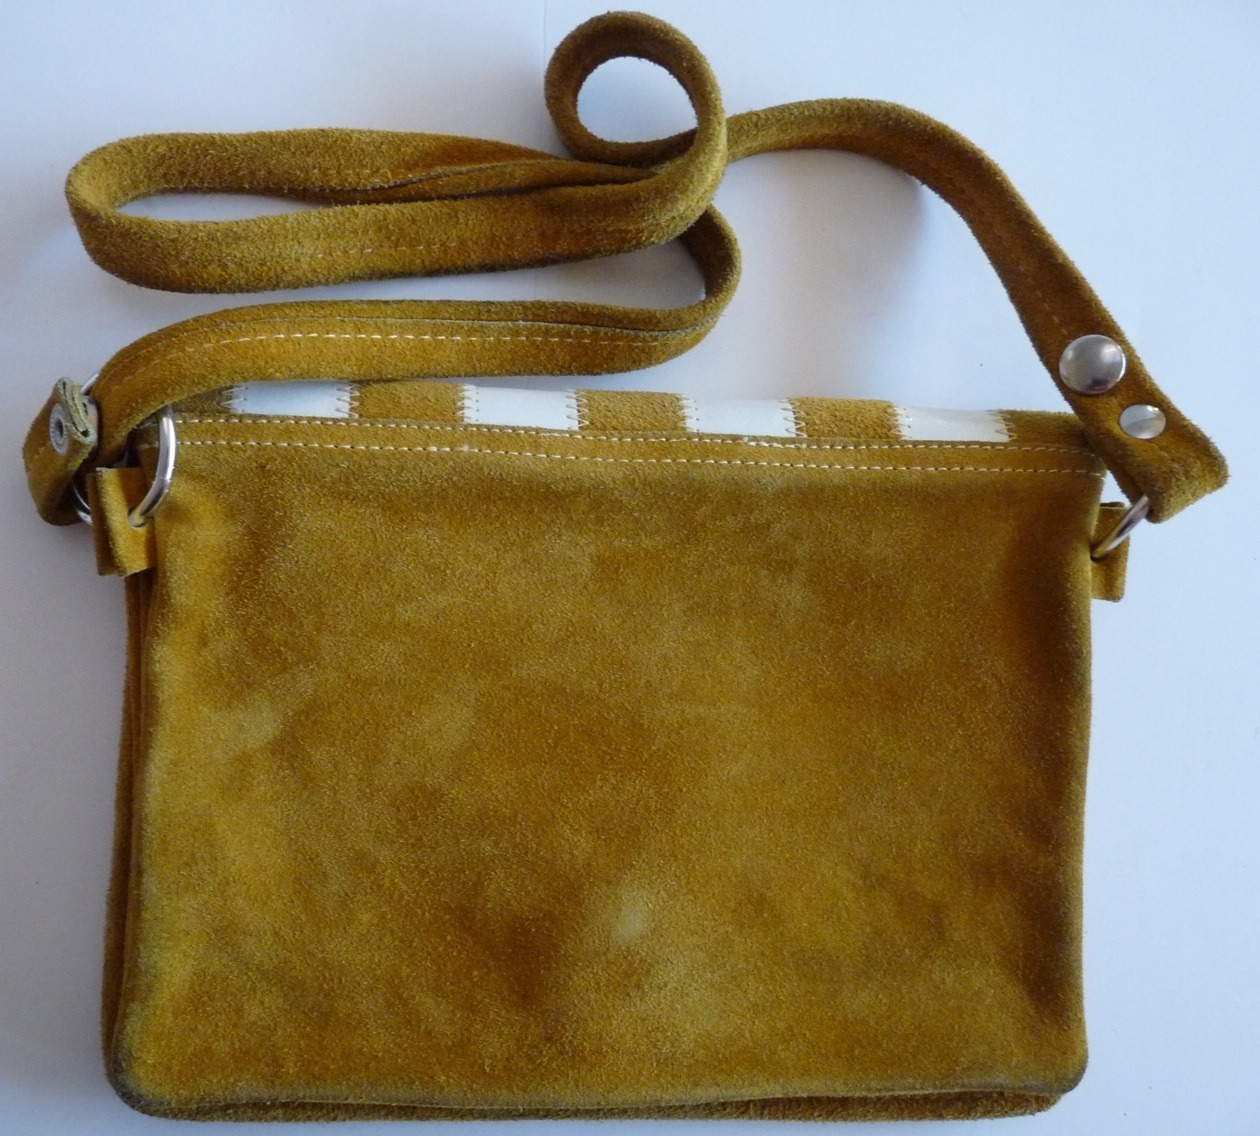 Gold suede & white mod women's shoulder bag 1970 vintage cross body